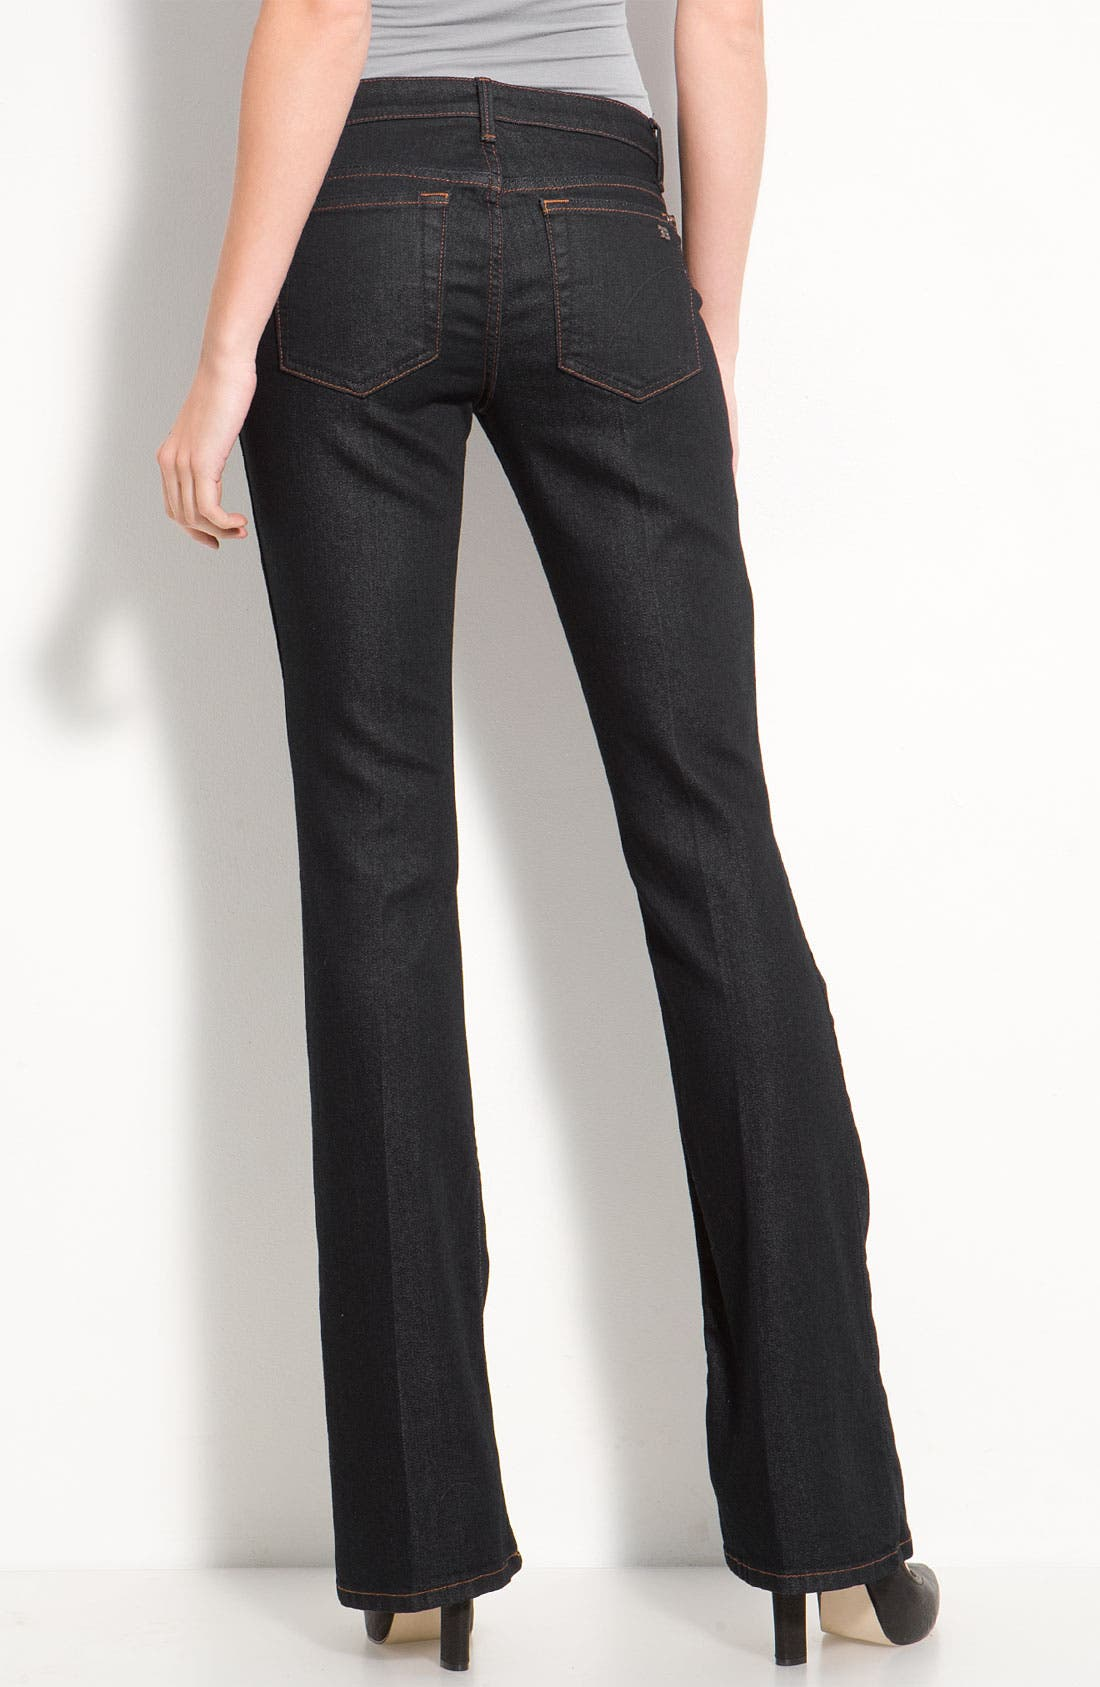 Alternate Image 1 Selected - Joe's 'Honey' Bootcut Stretch Denim Jeans (Geraldine Dark Wash)